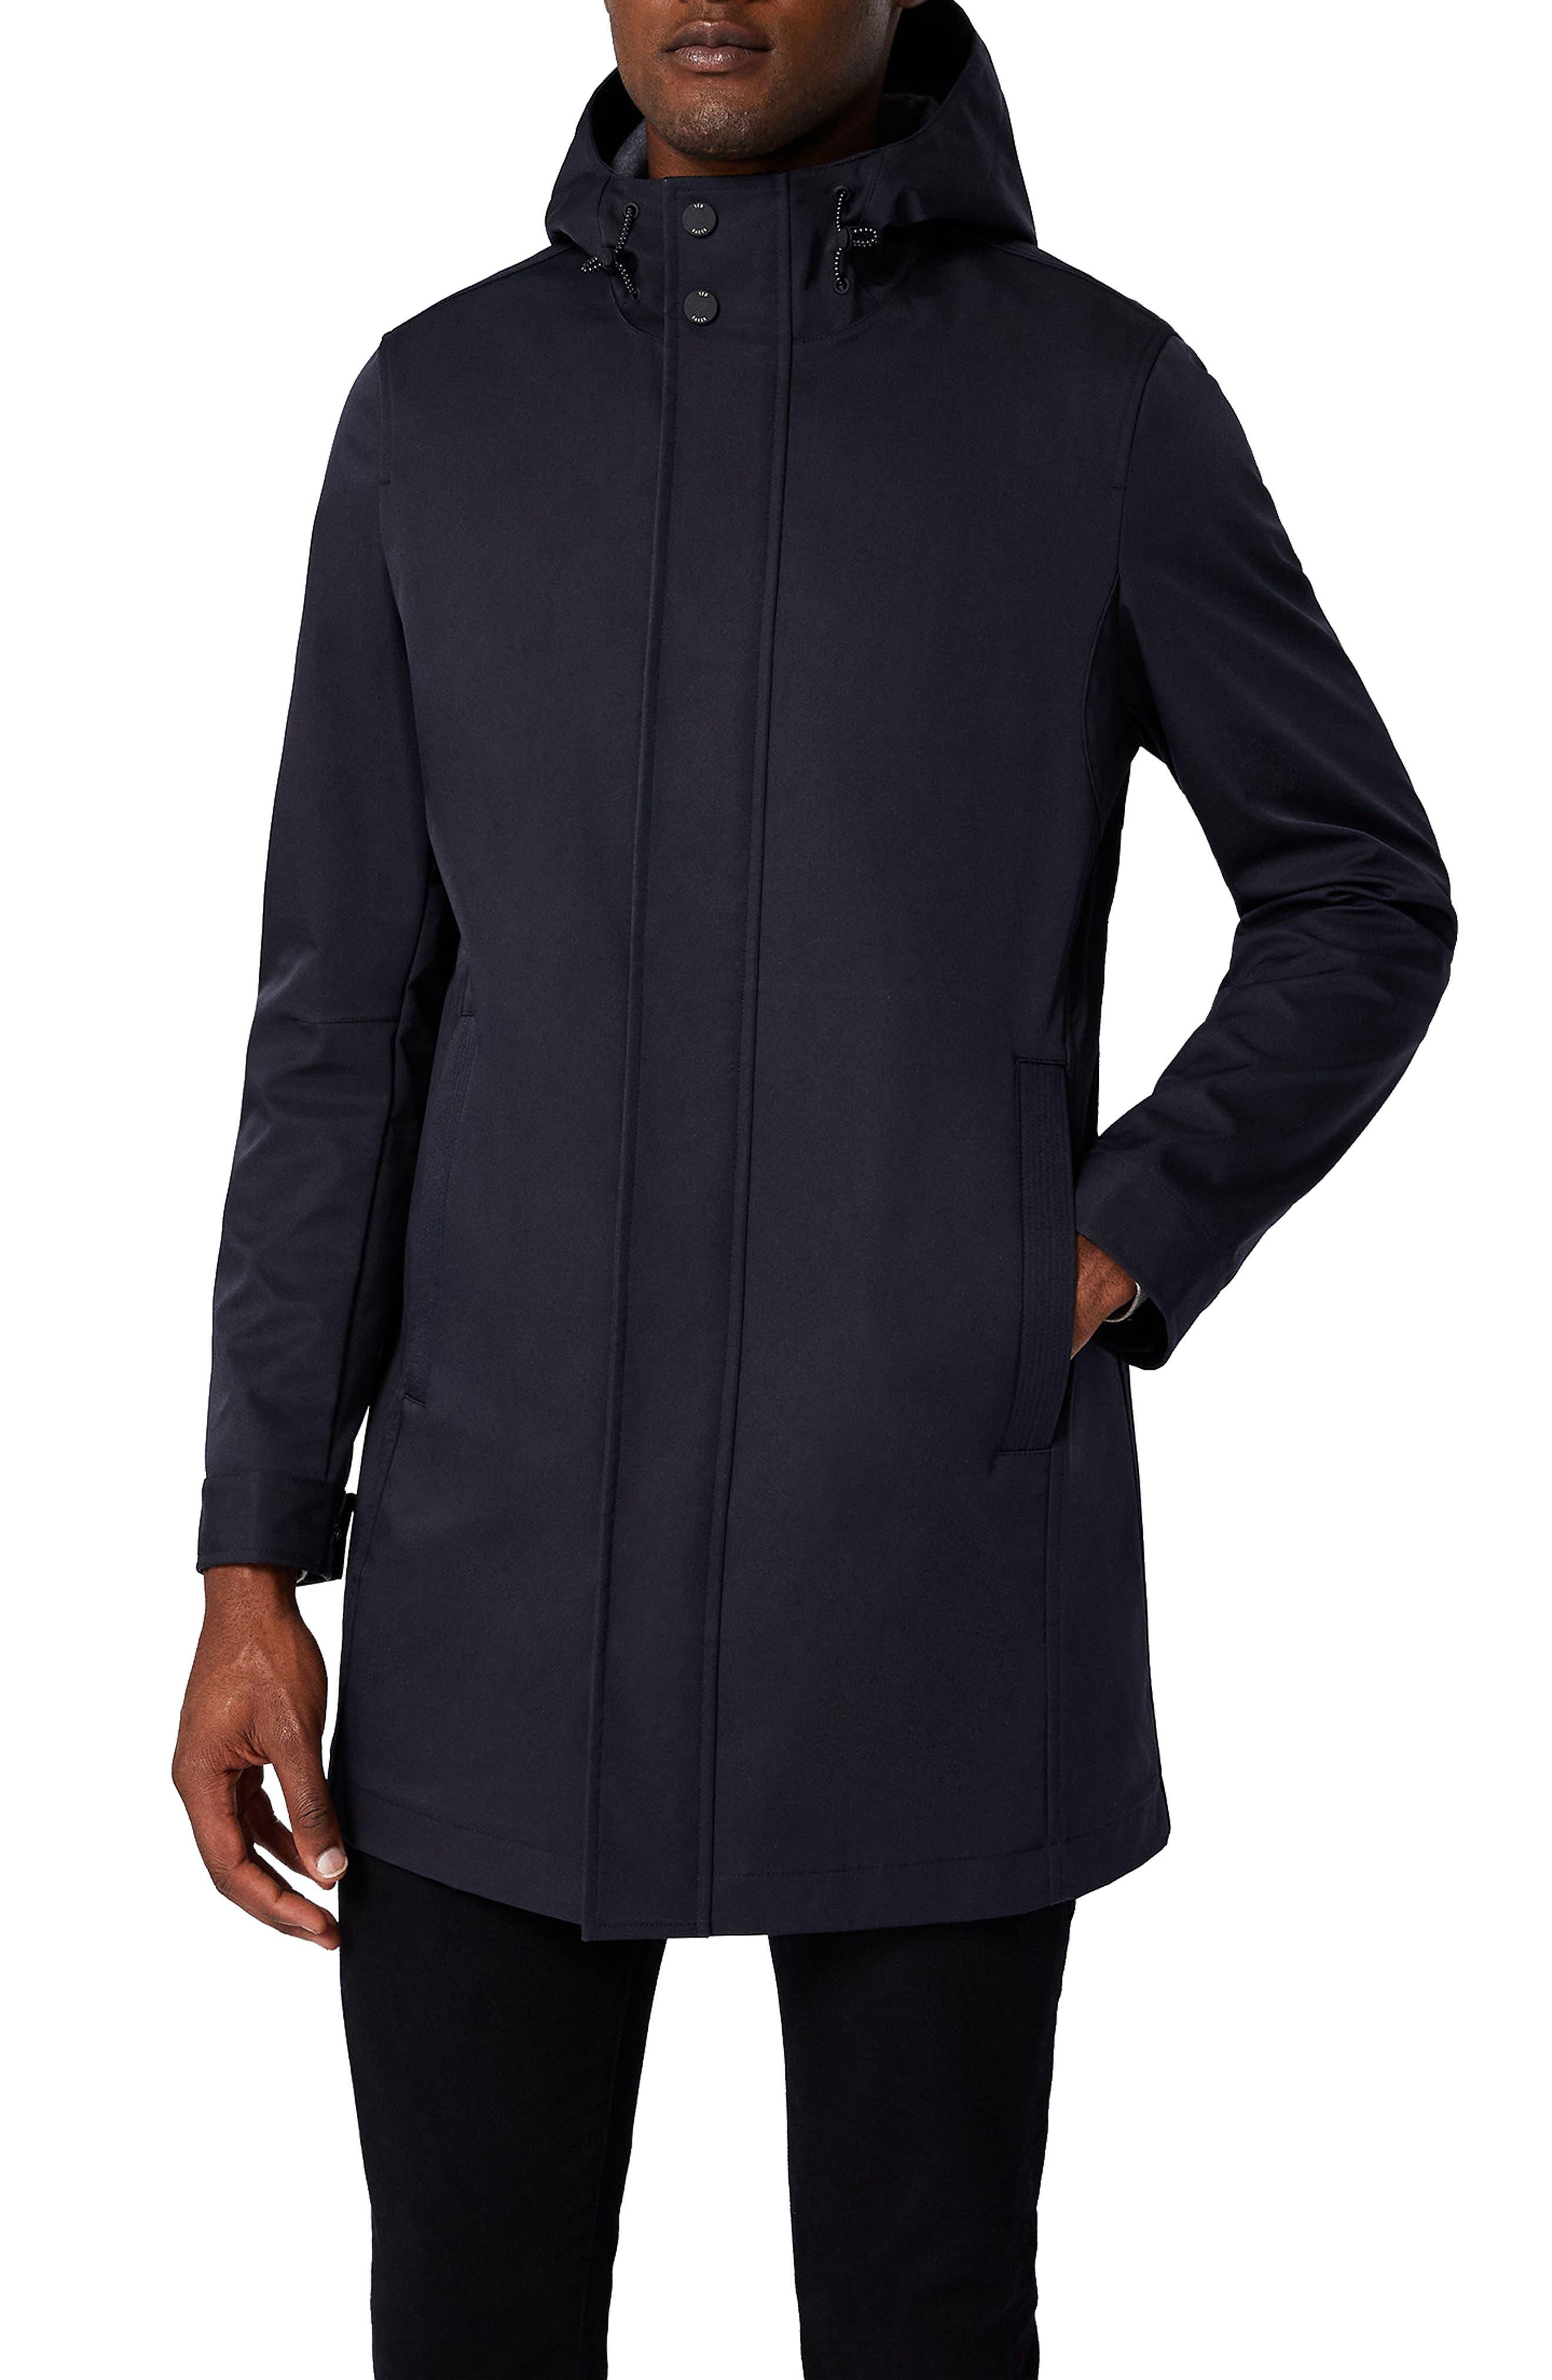 Vernett Hooded Jacket,                         Main,                         color, 410